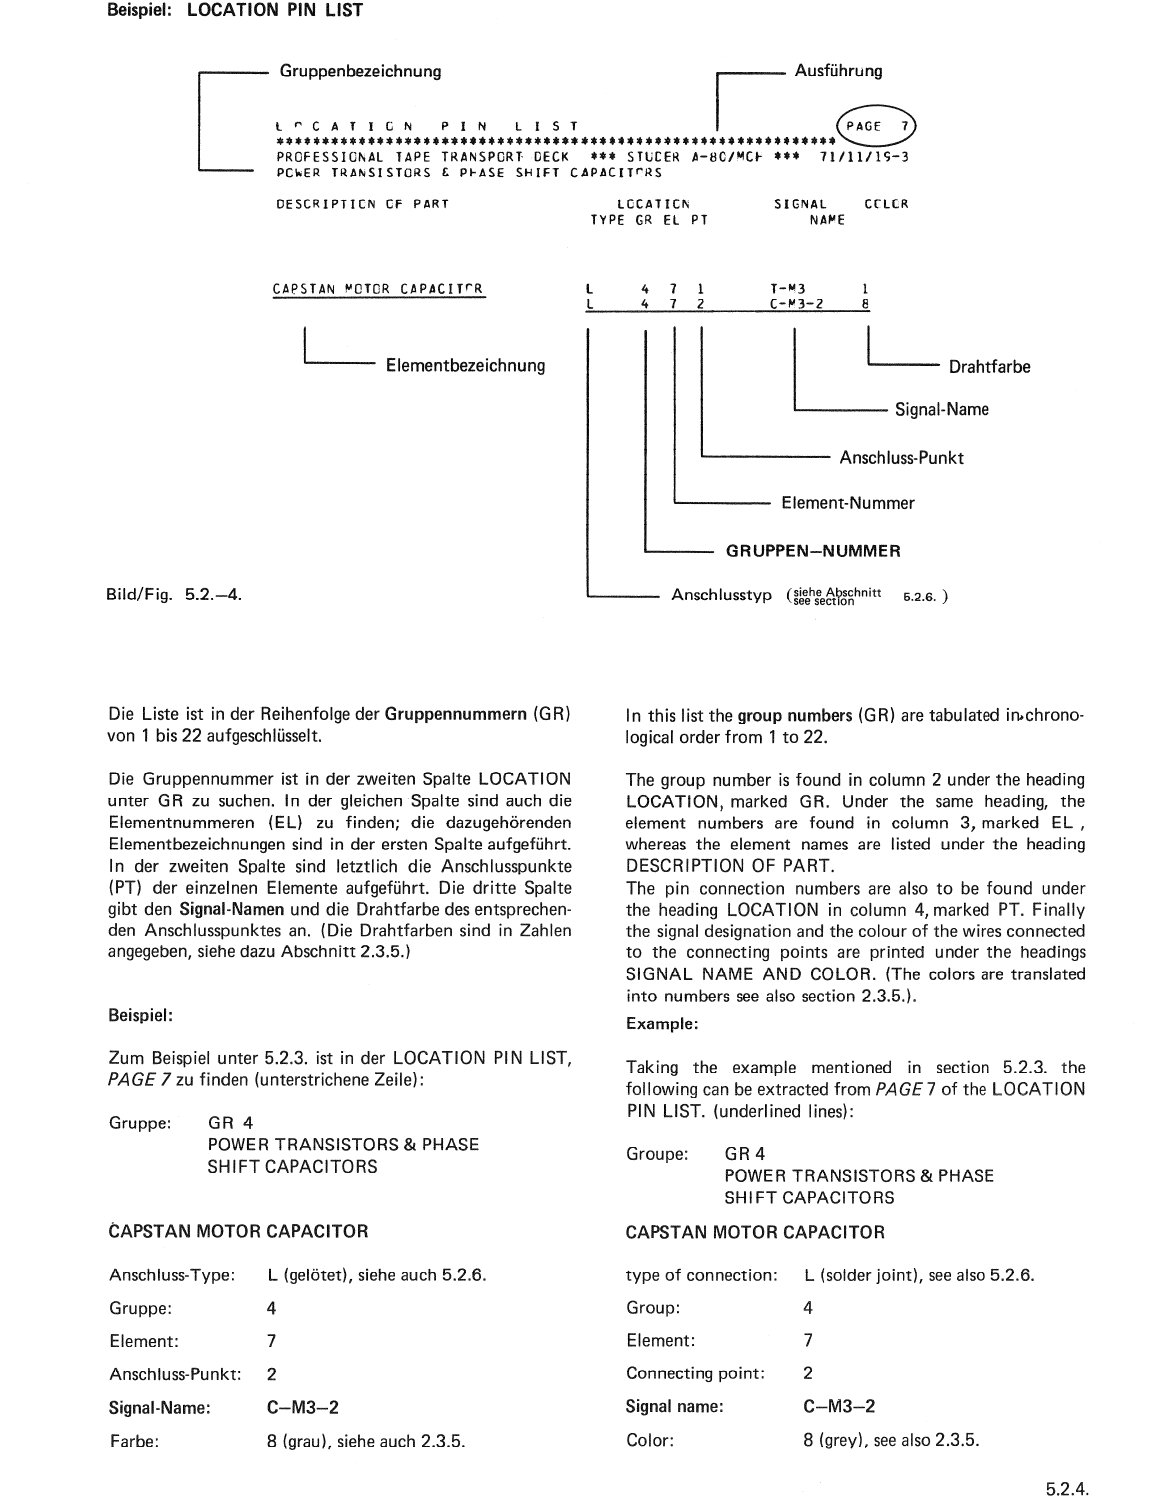 Mittwoch, 5. April 2006.max A80VU_Mk I_Serv A80VU Mk I Serv